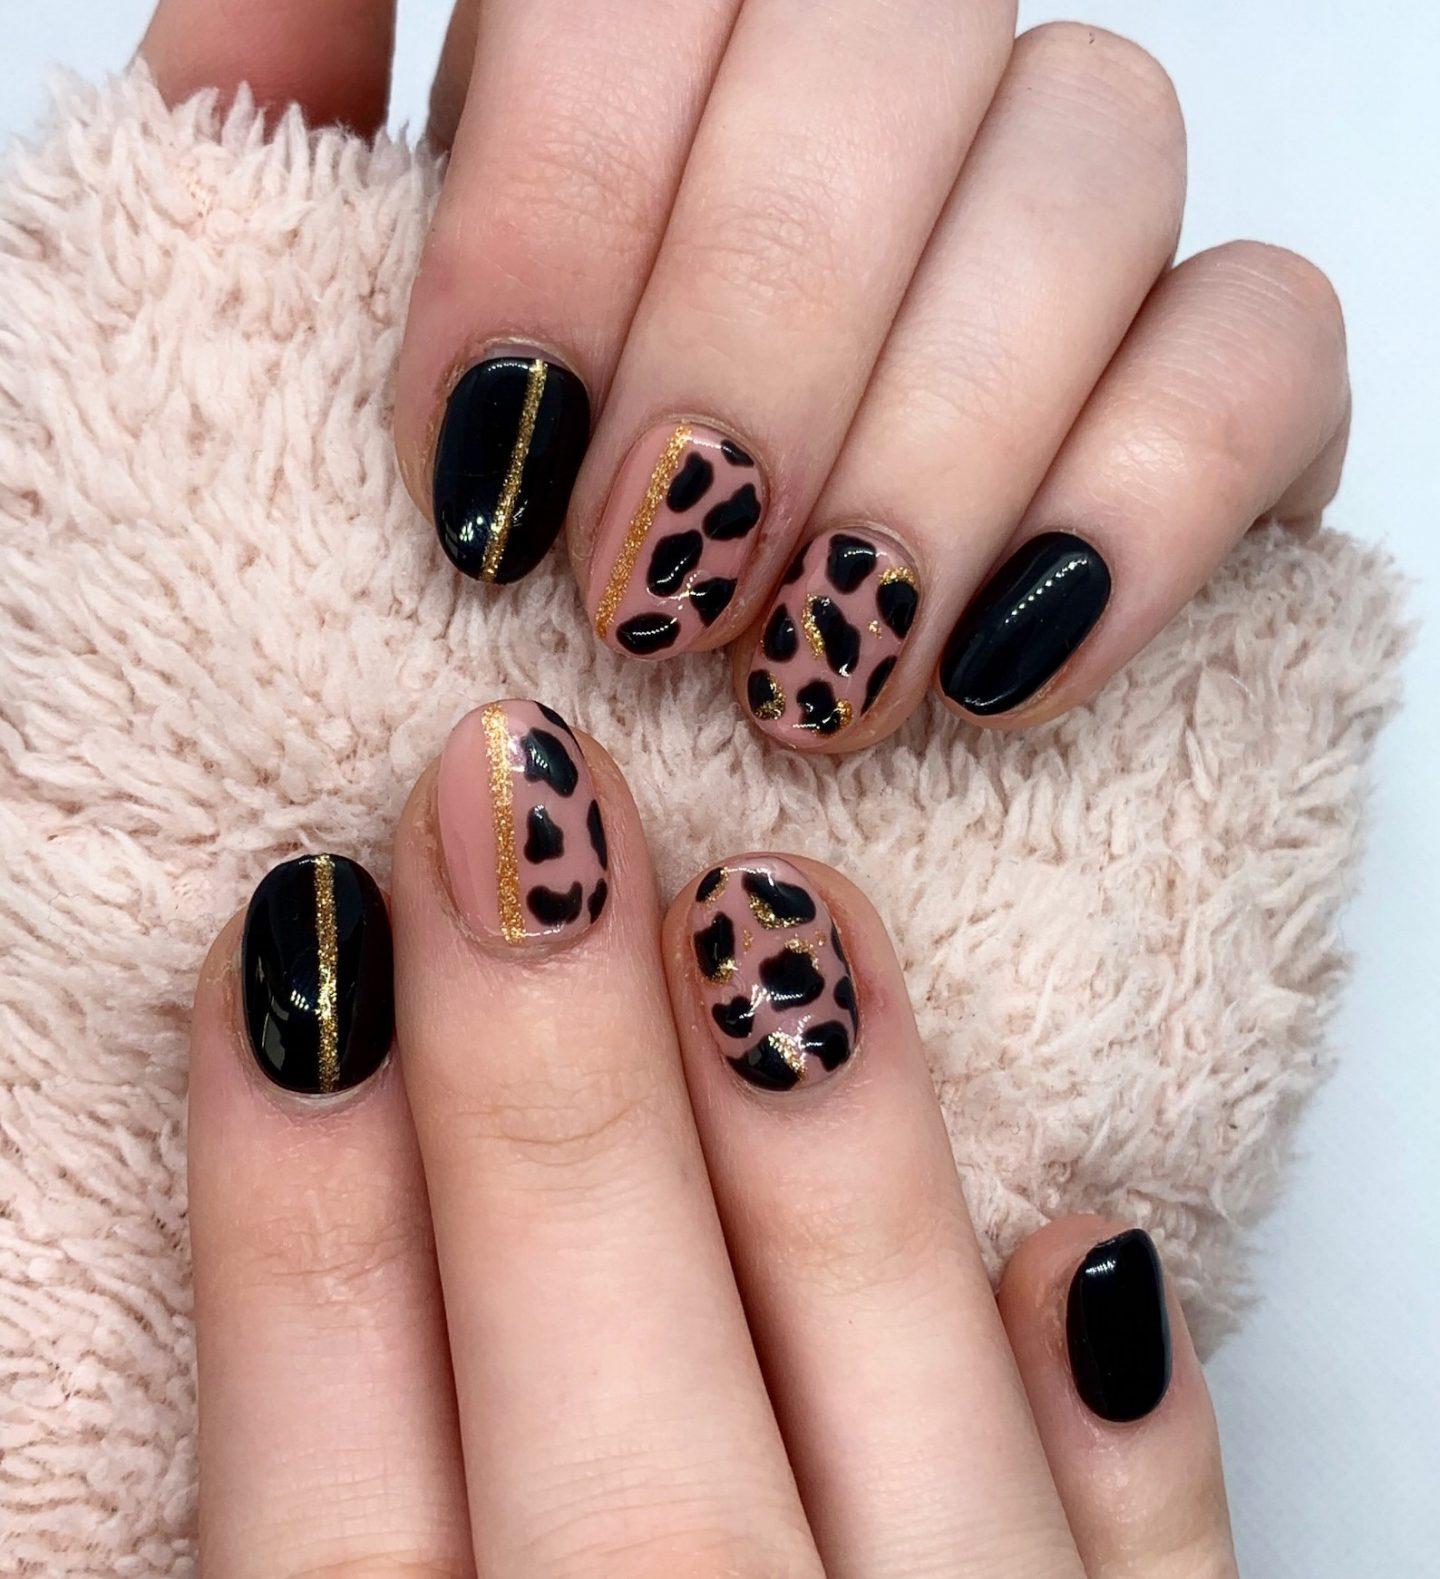 Cute short black and gold leopard print nails